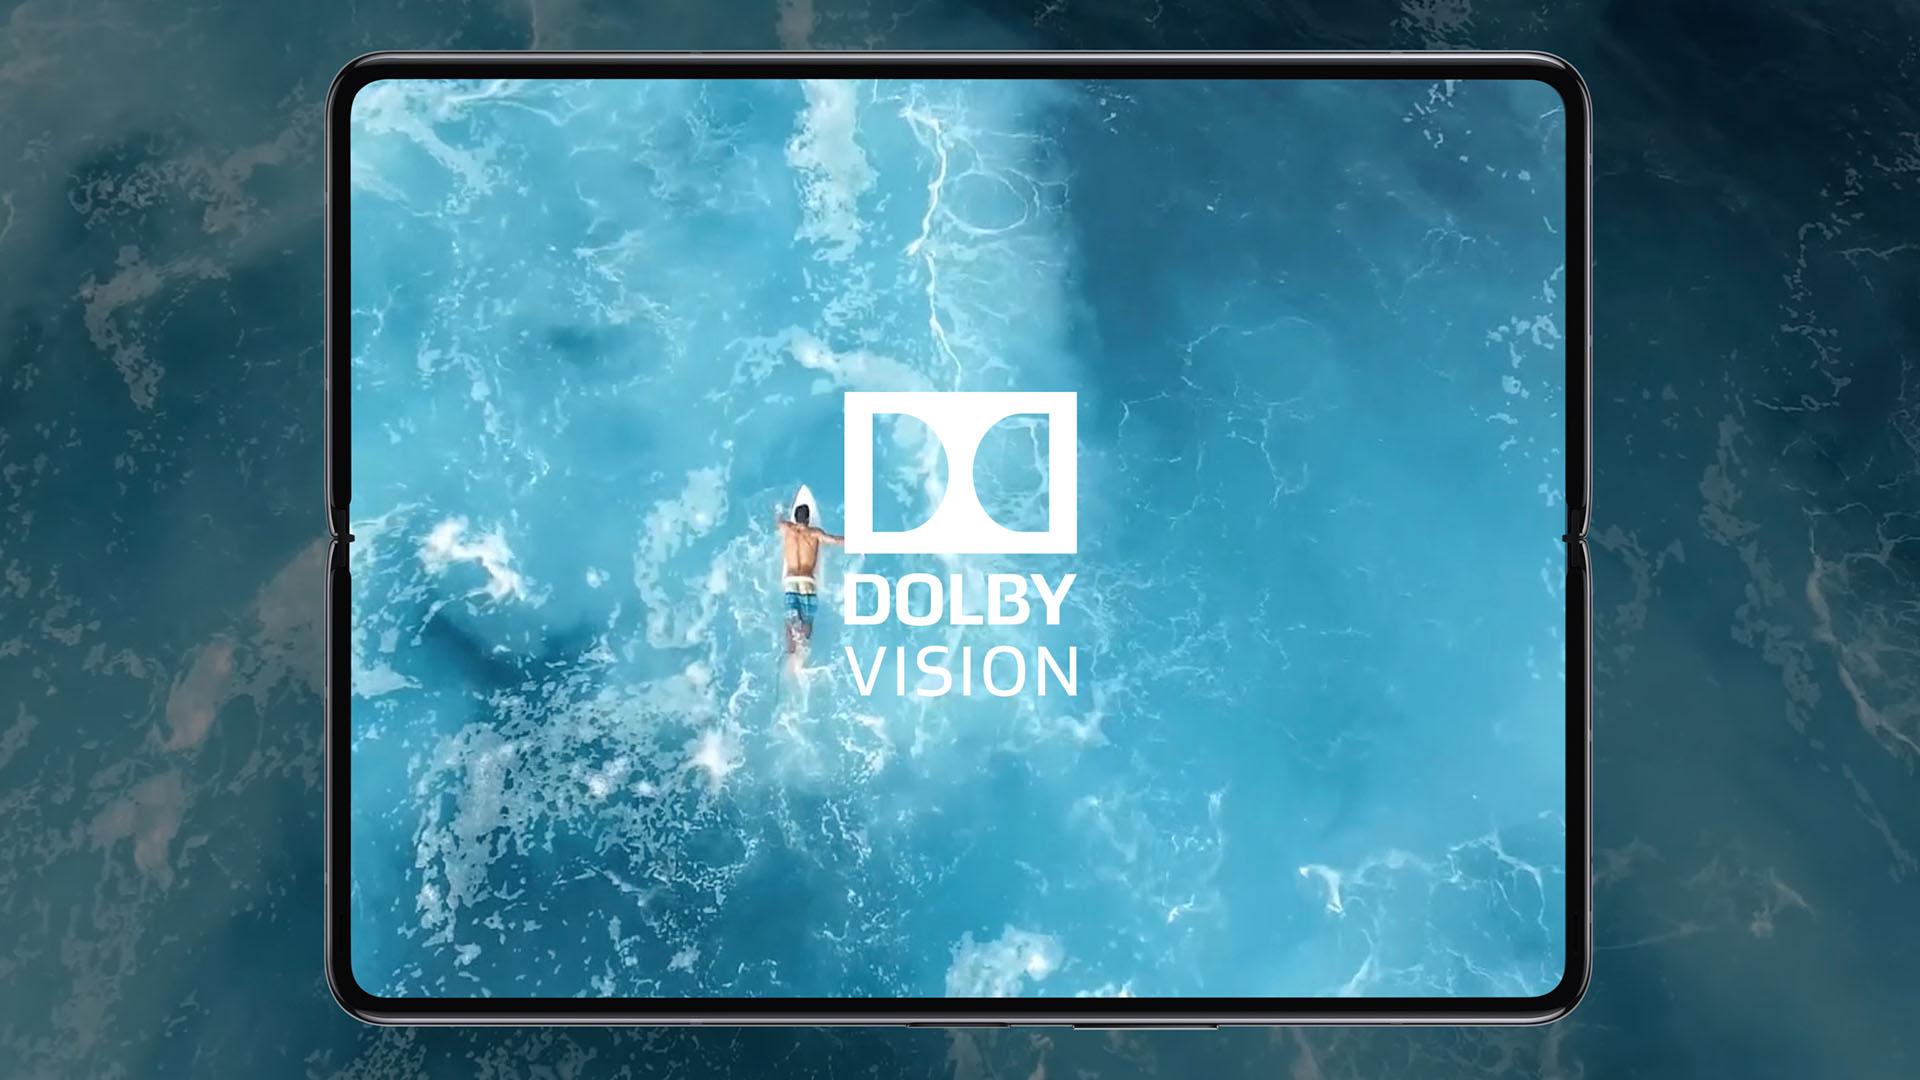 Xiaomi Mi MIX Fold Dolby Vision